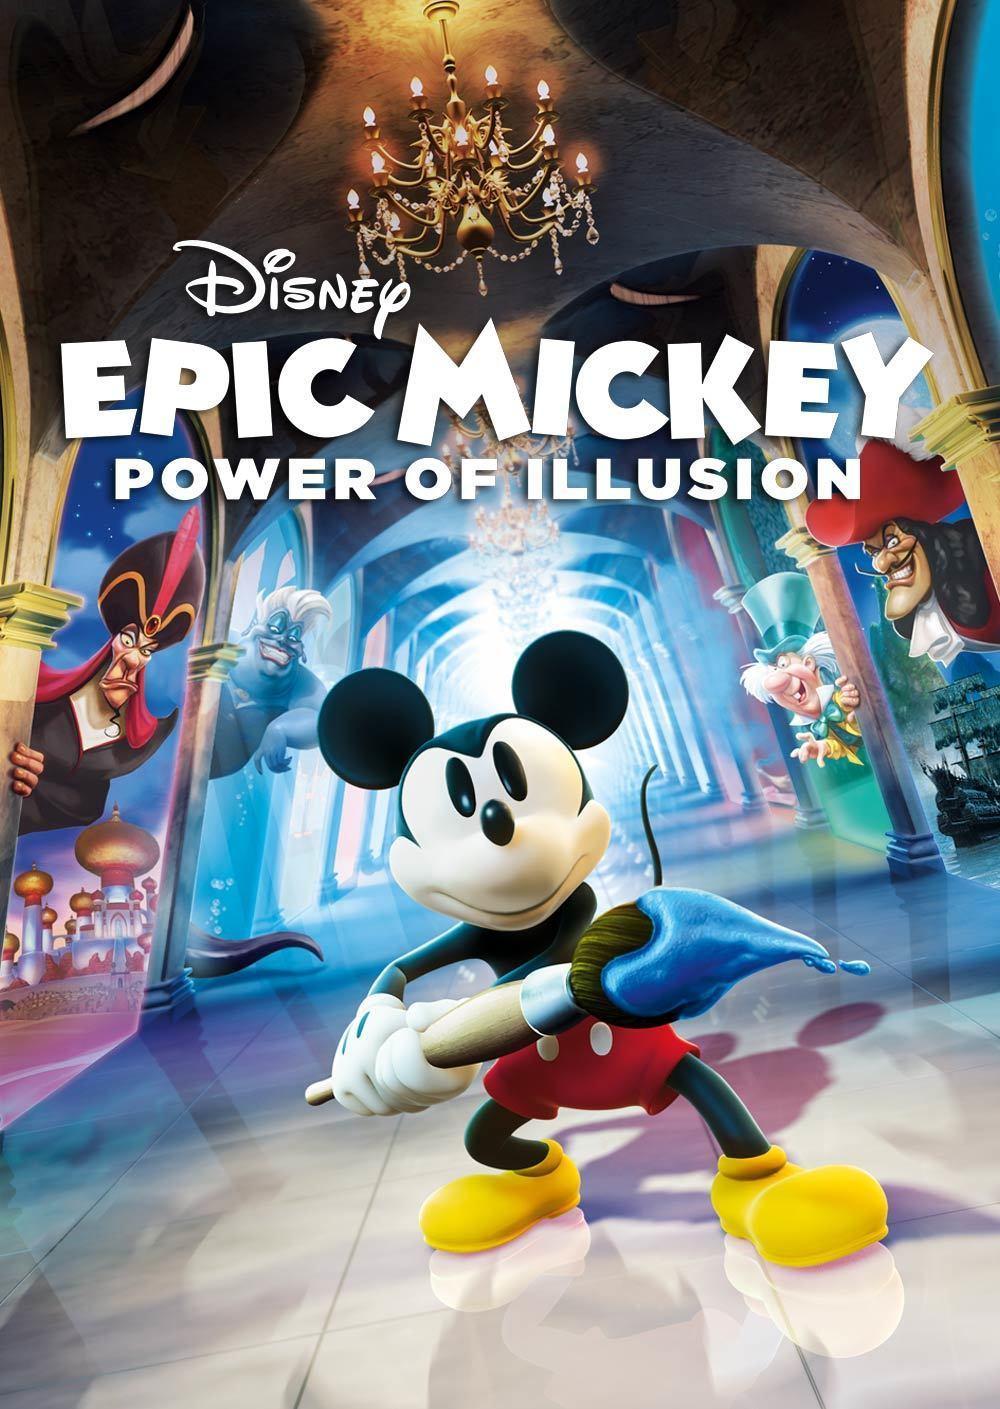 Disney Games For Ps3 : Disney art academy lol